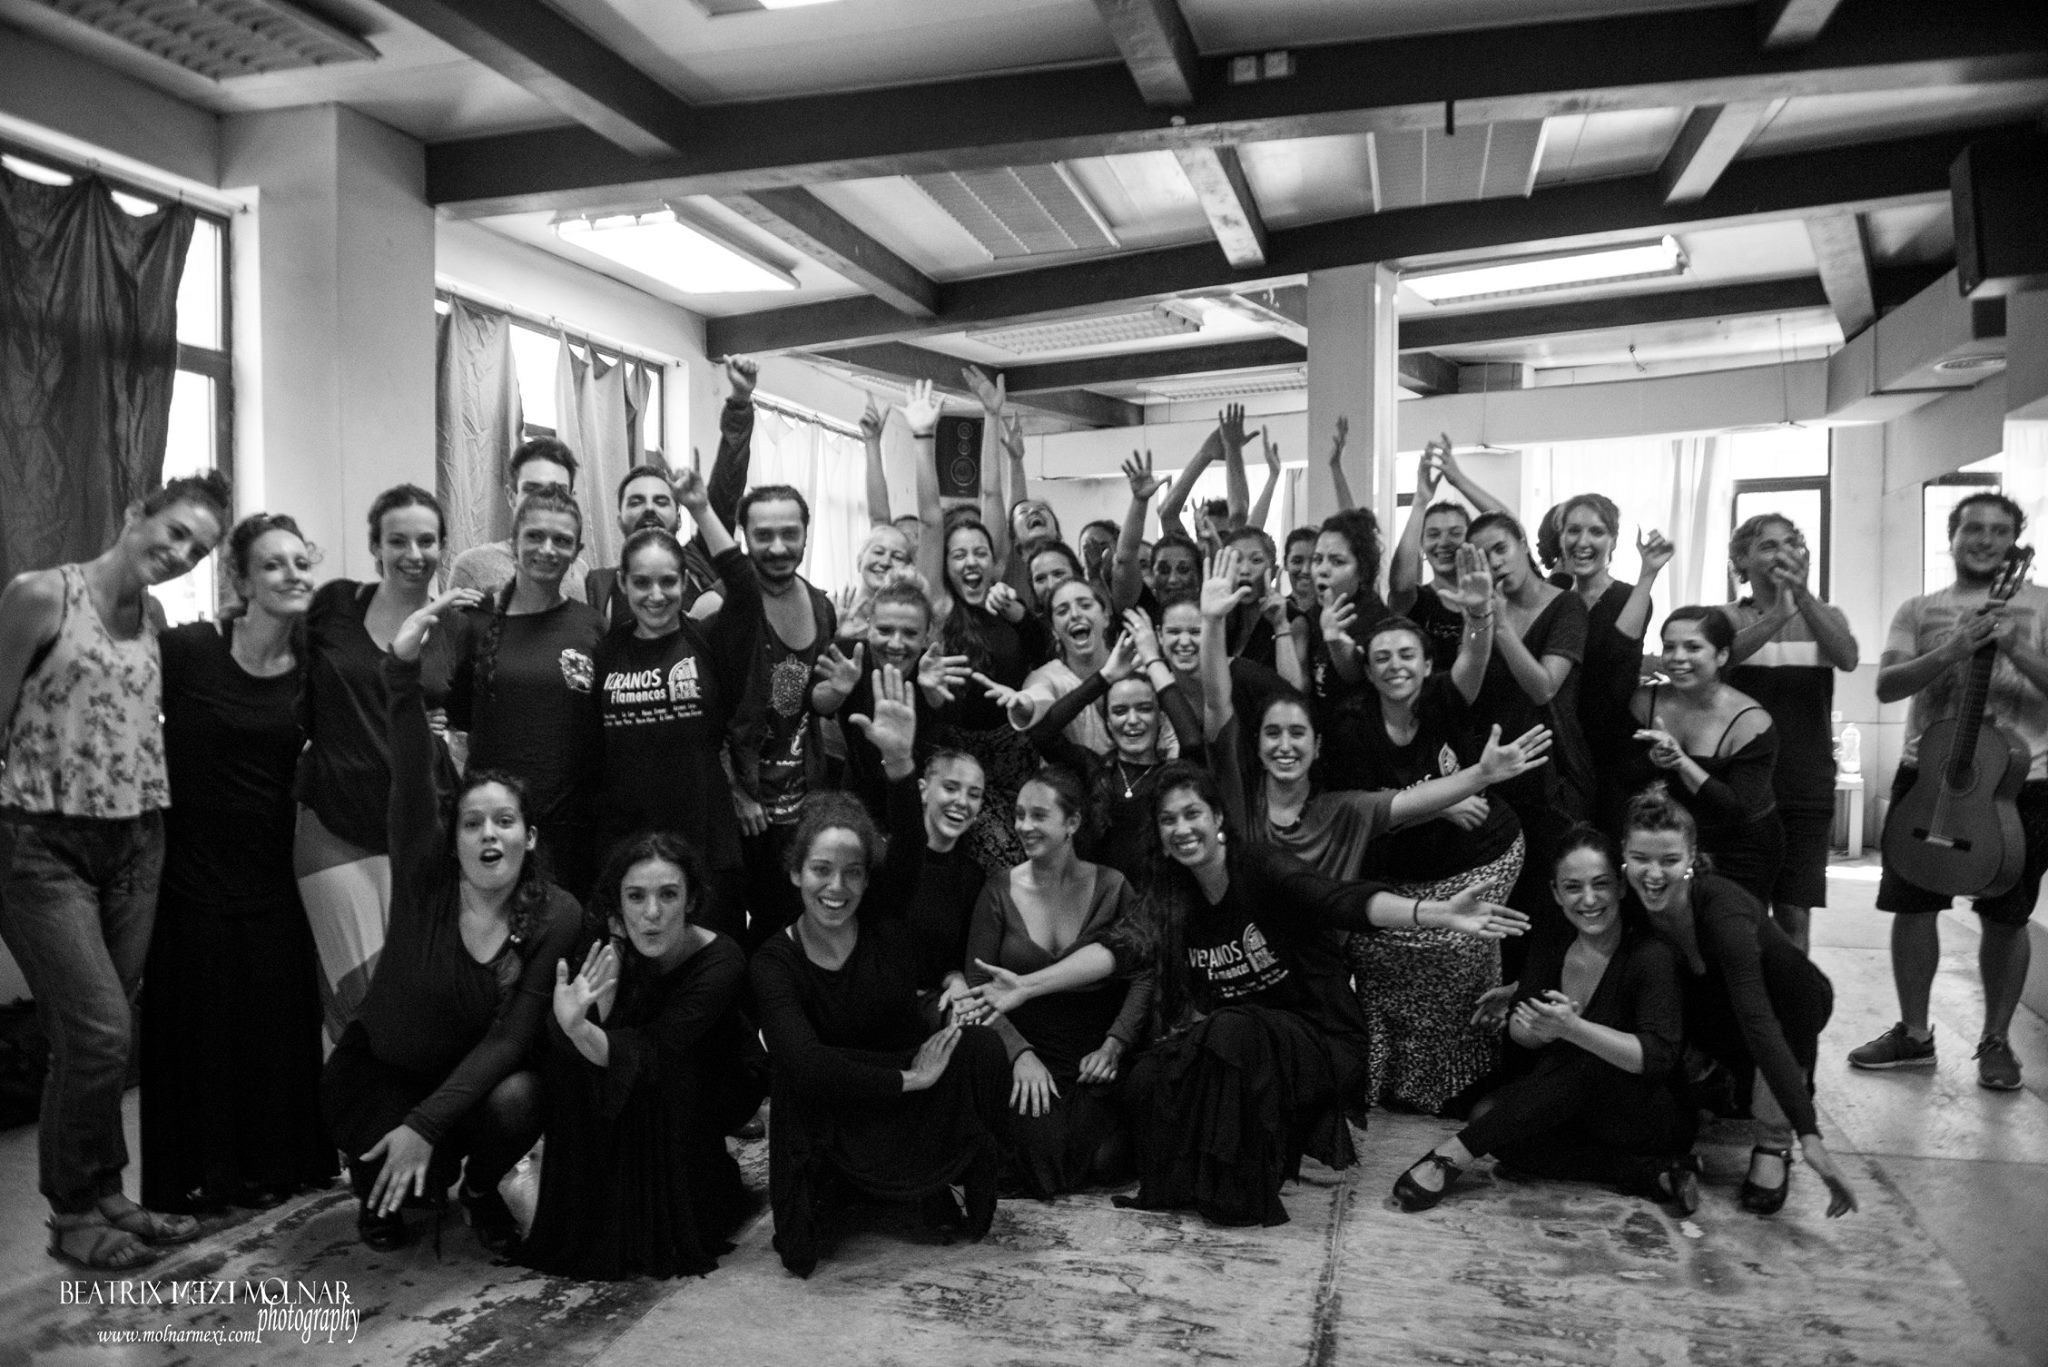 workshops with La Lupi at Amor de Dios in Madrid